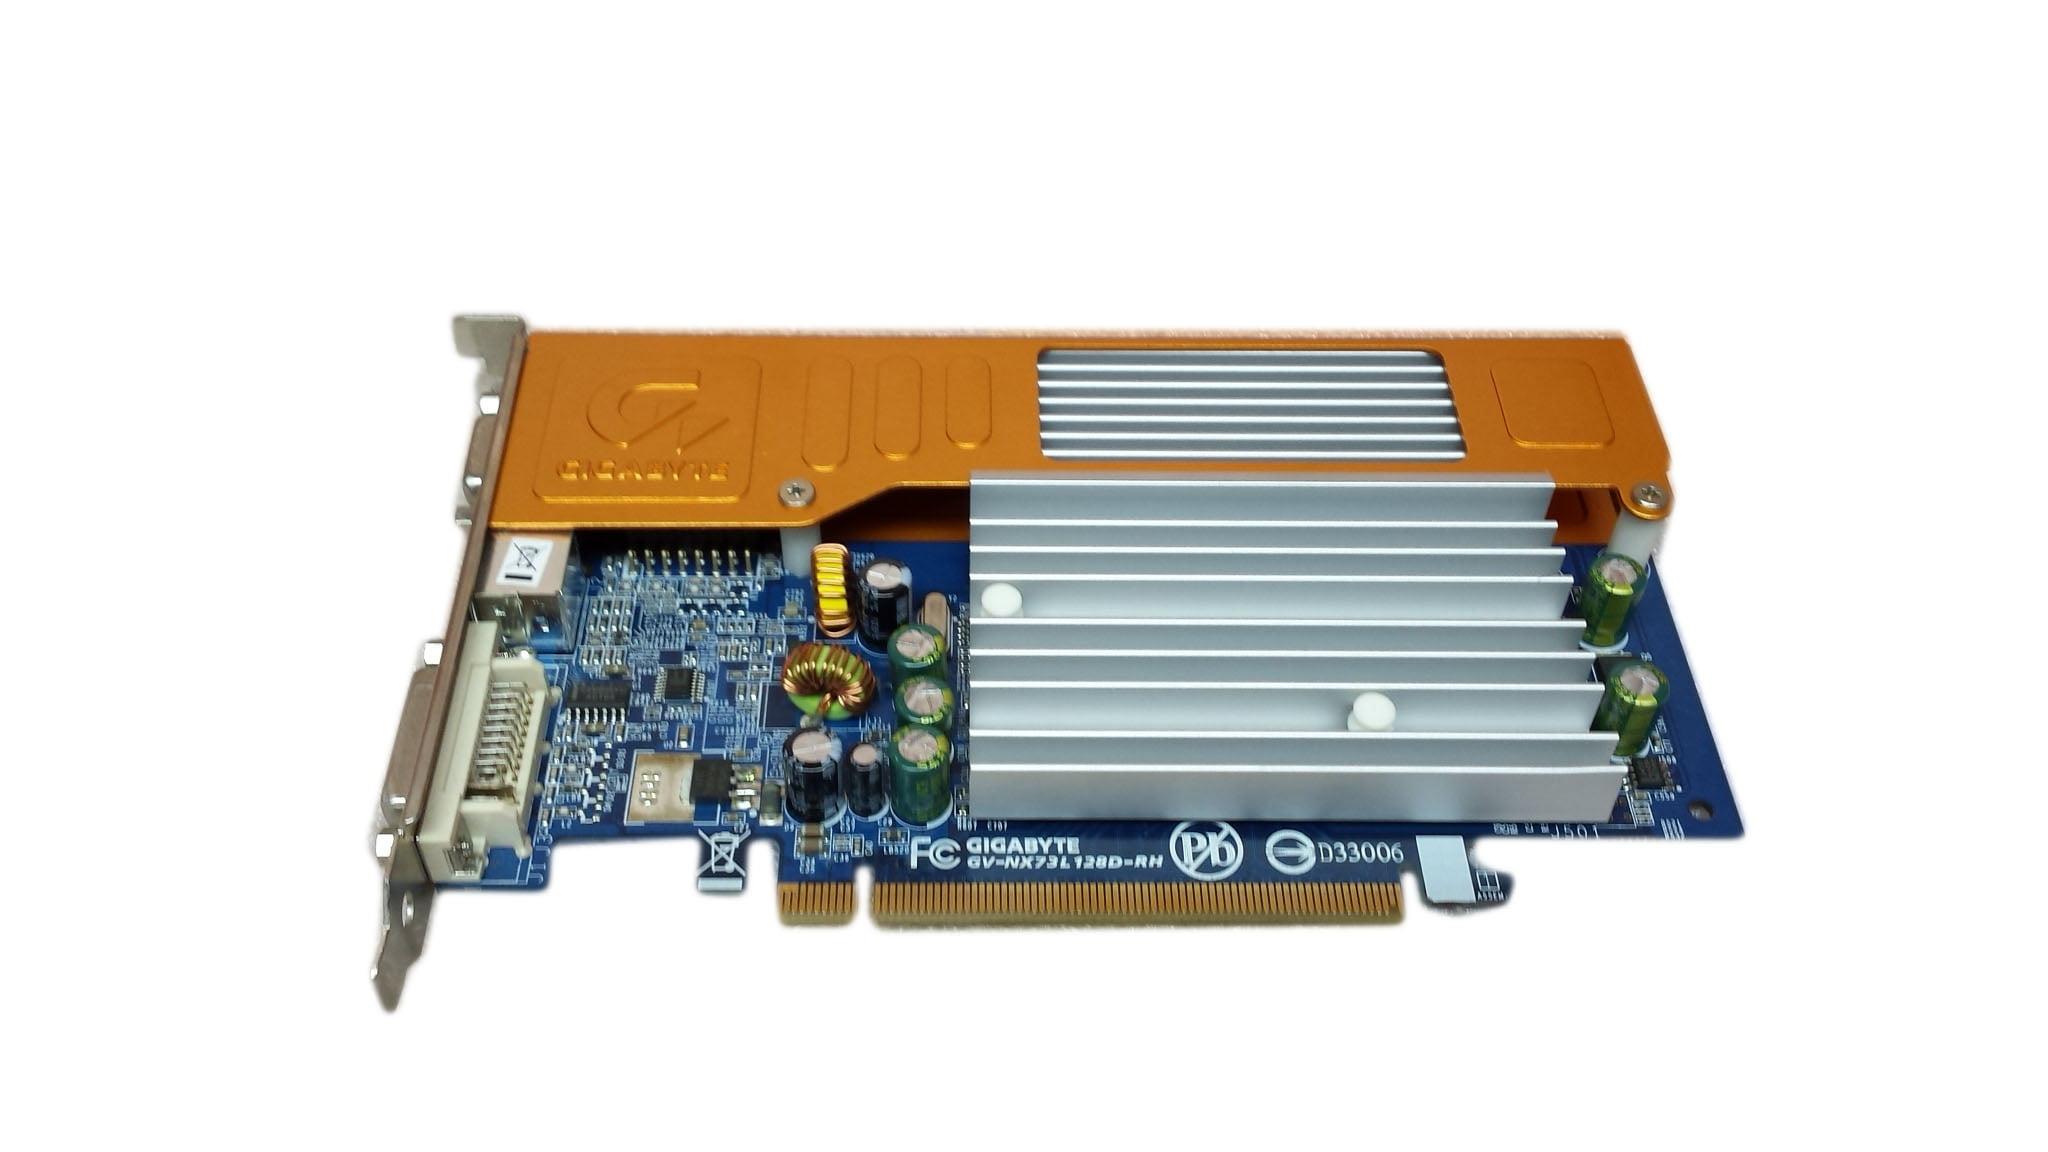 Gigabyte NVIDIA GeForce 7300 LE 128 MB DDR2 SDRAM PCI